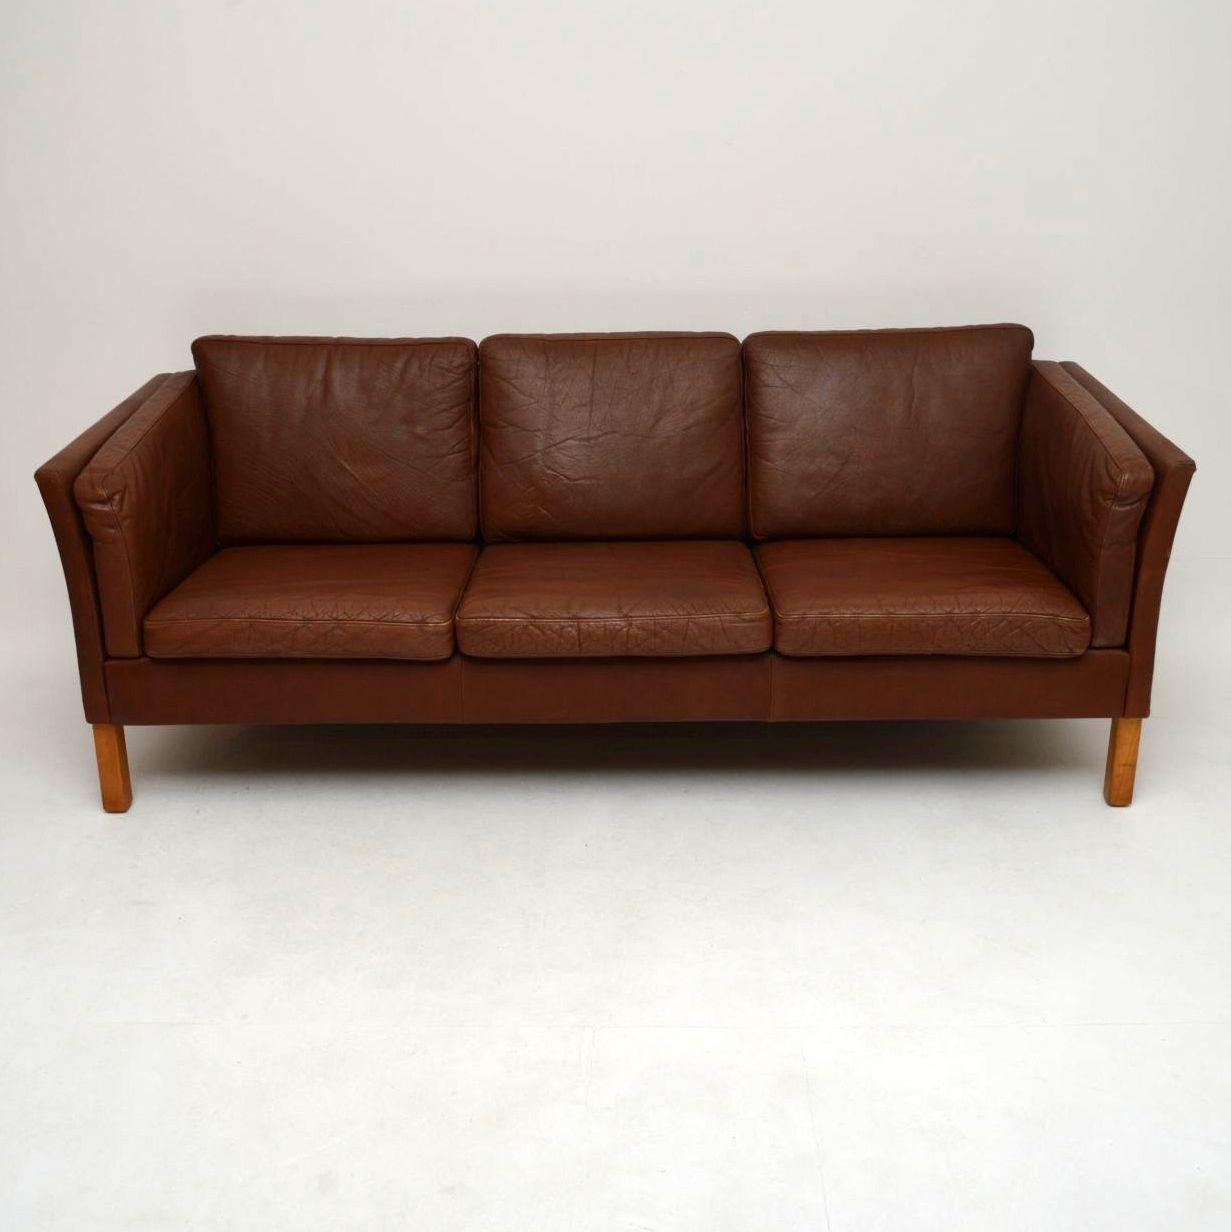 vintage leather sectional sofa quality sofas brands danish retro 1960s retrospective